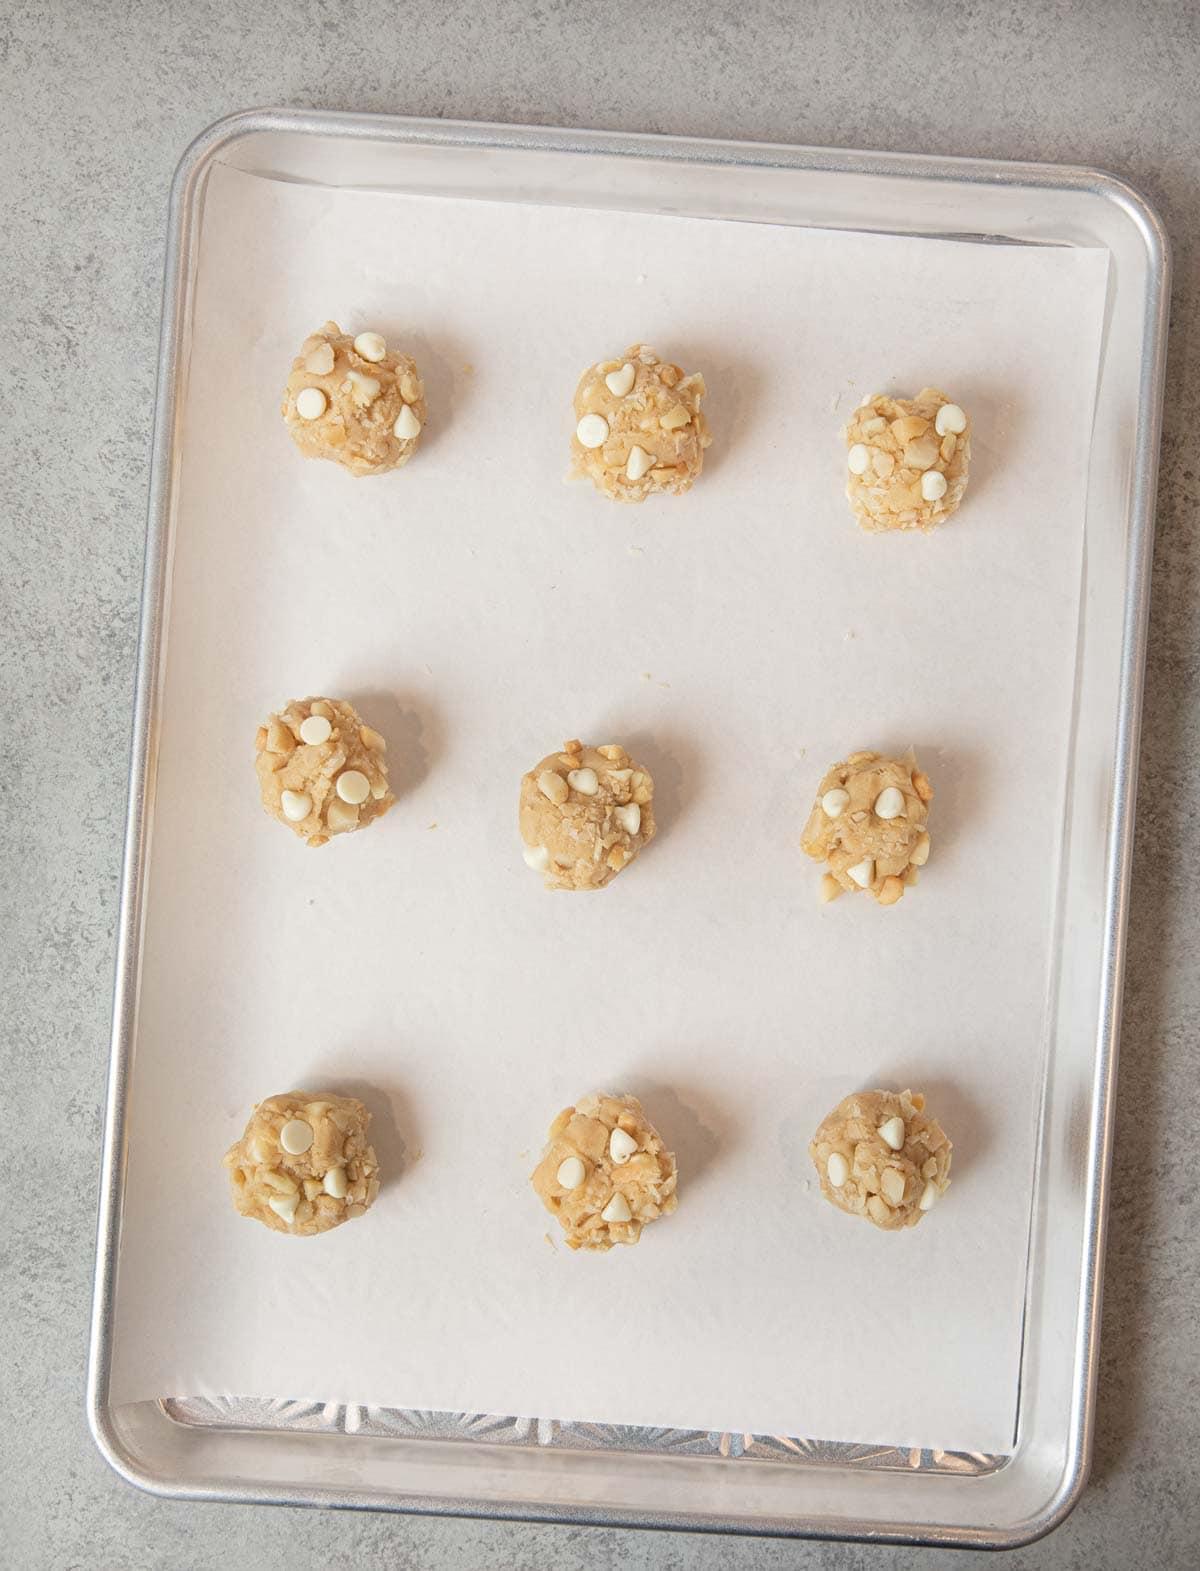 White Chocolate Macadamia Chip Cookies dough balls on baking sheet